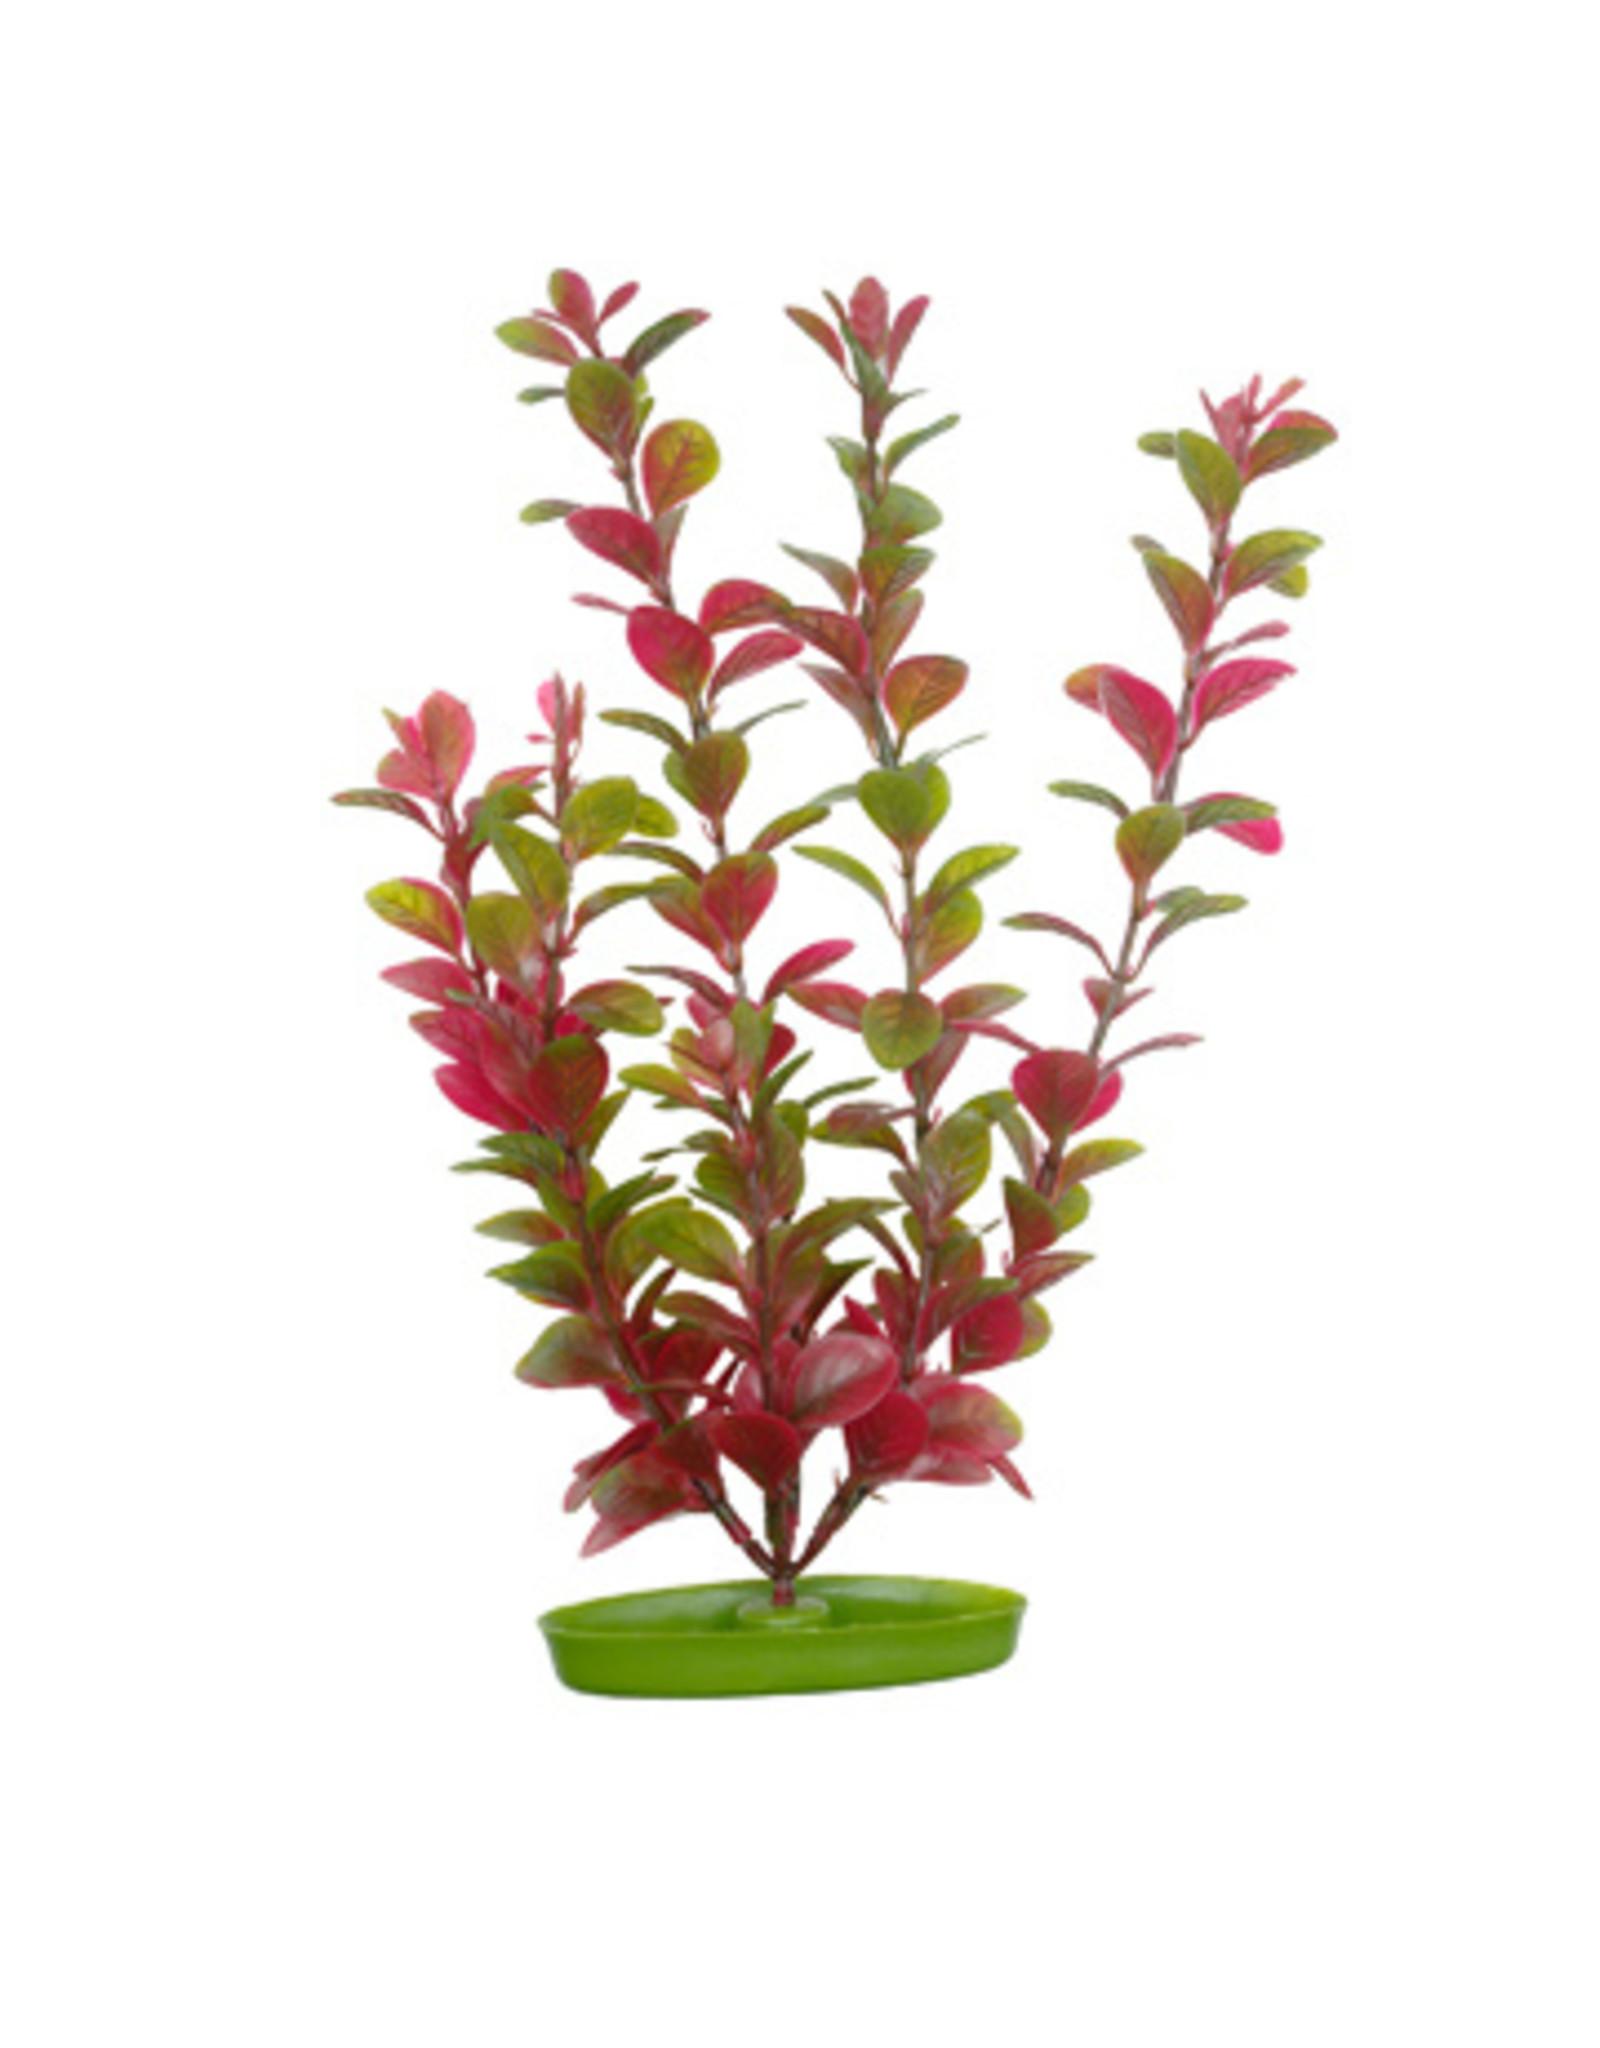 Marina MARINA AquaScaper Plants Red Ludwigia